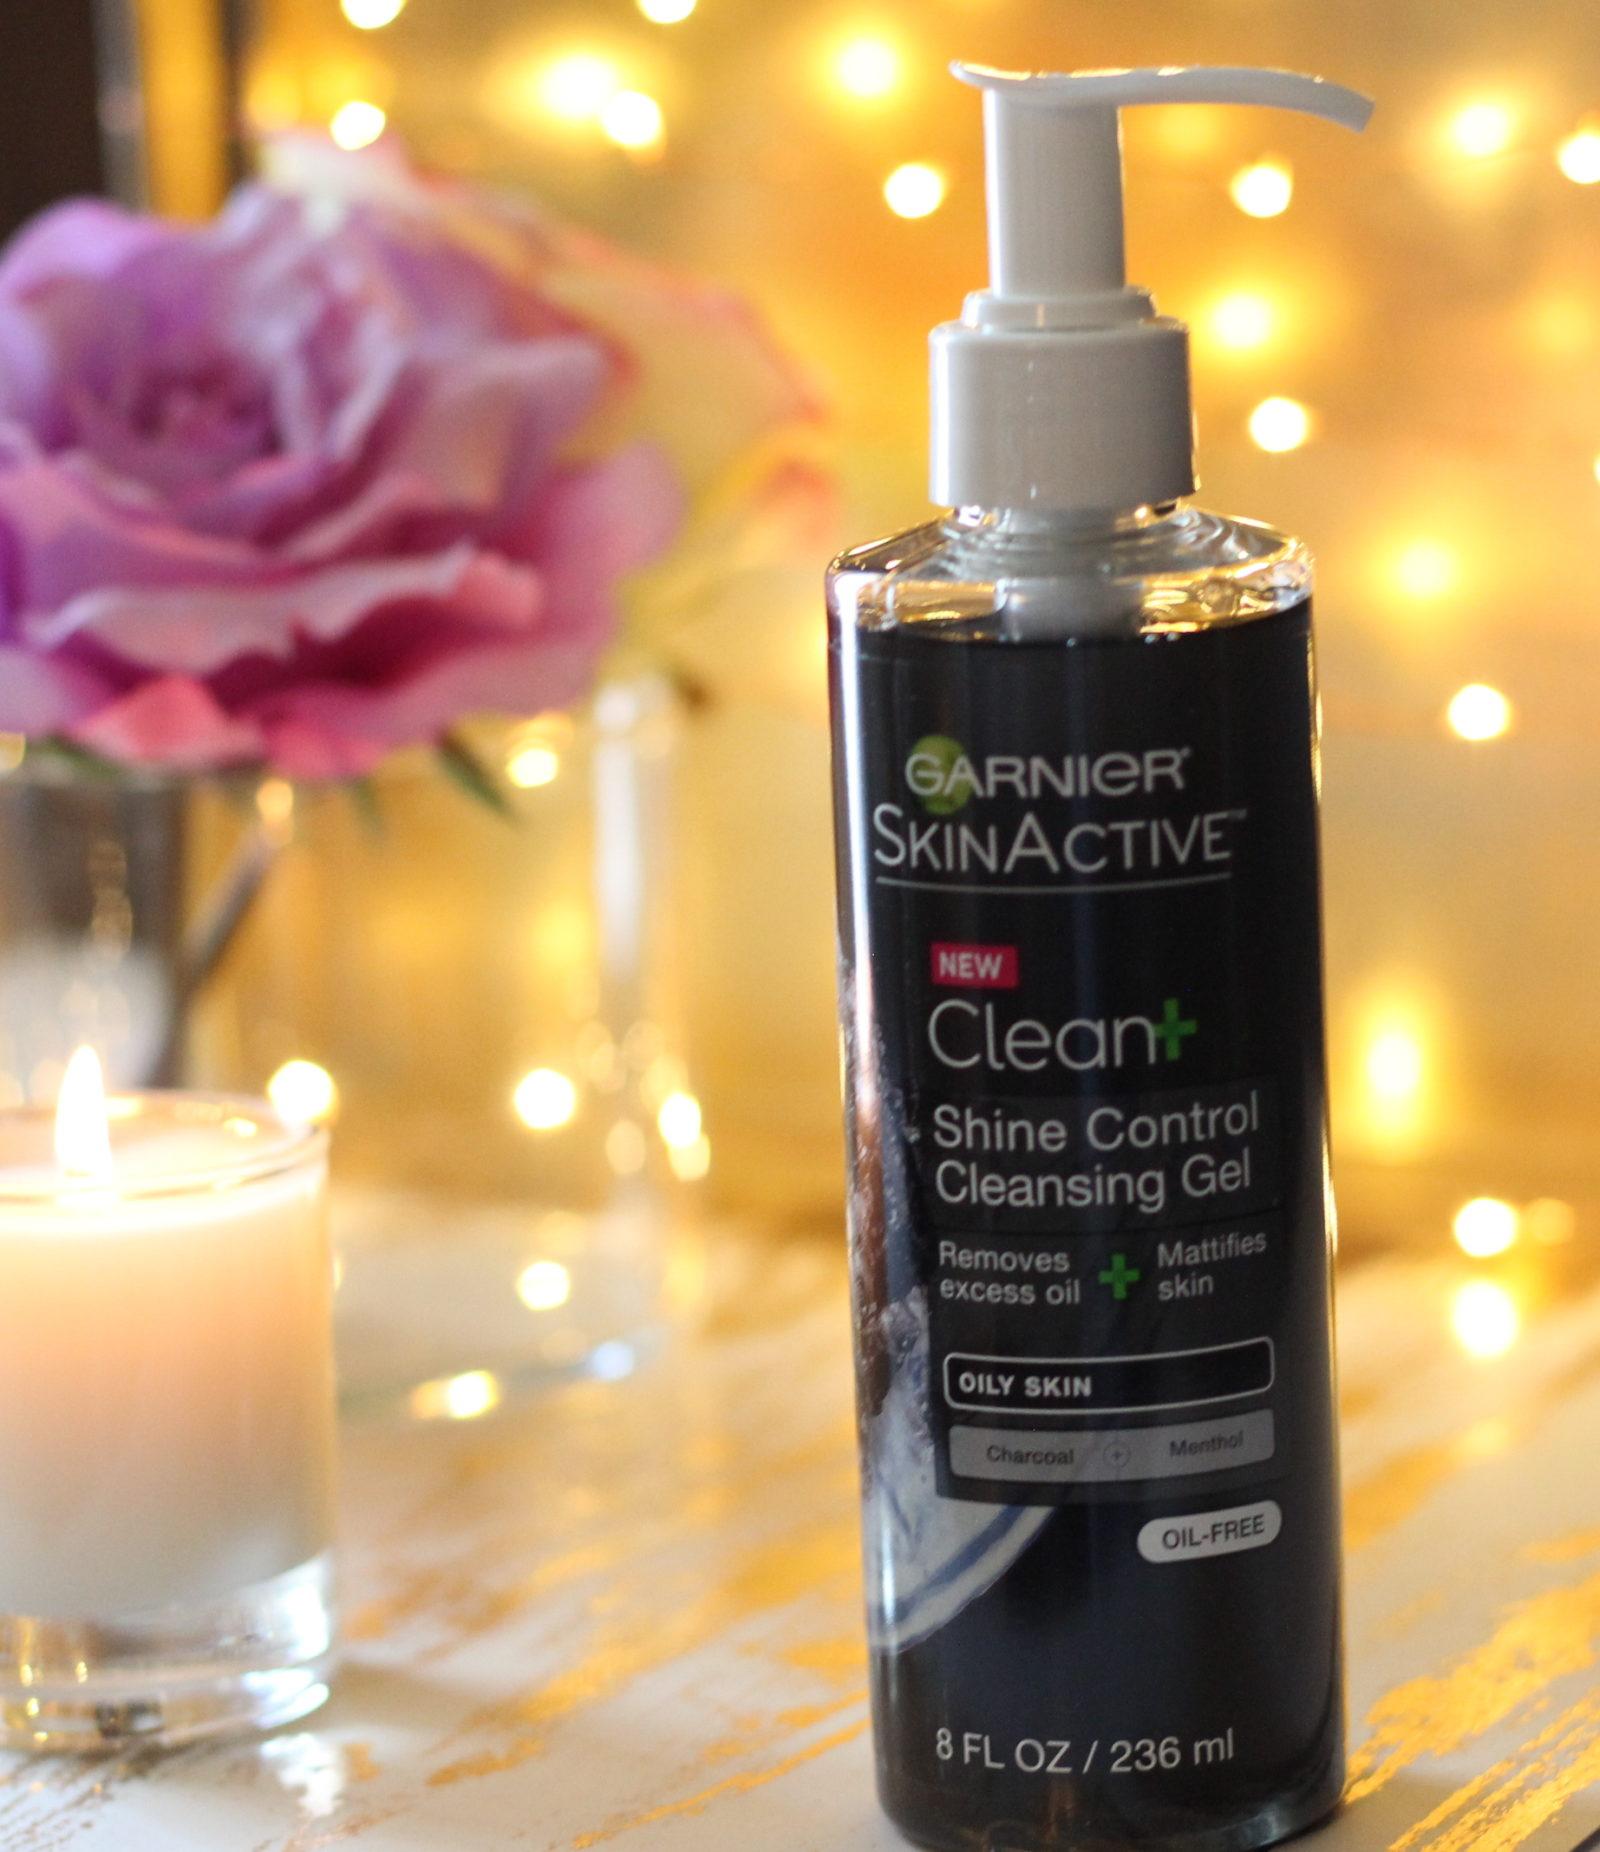 Garnier SkinActive Clean+ Shine Control Cleansing Gel